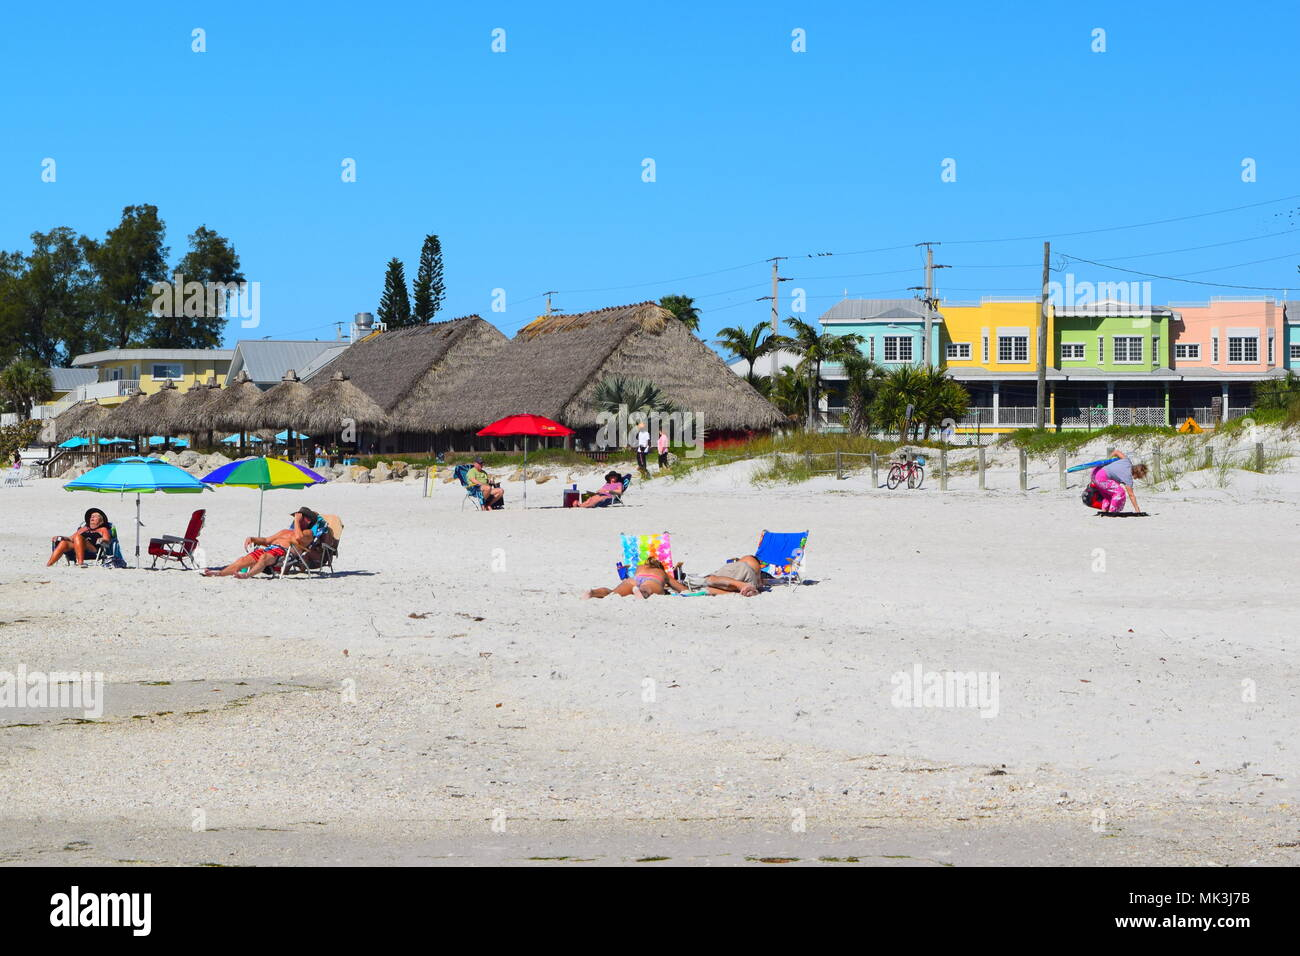 Bradenton Beach On Anna Maria Island In Florida Colorful Small Town